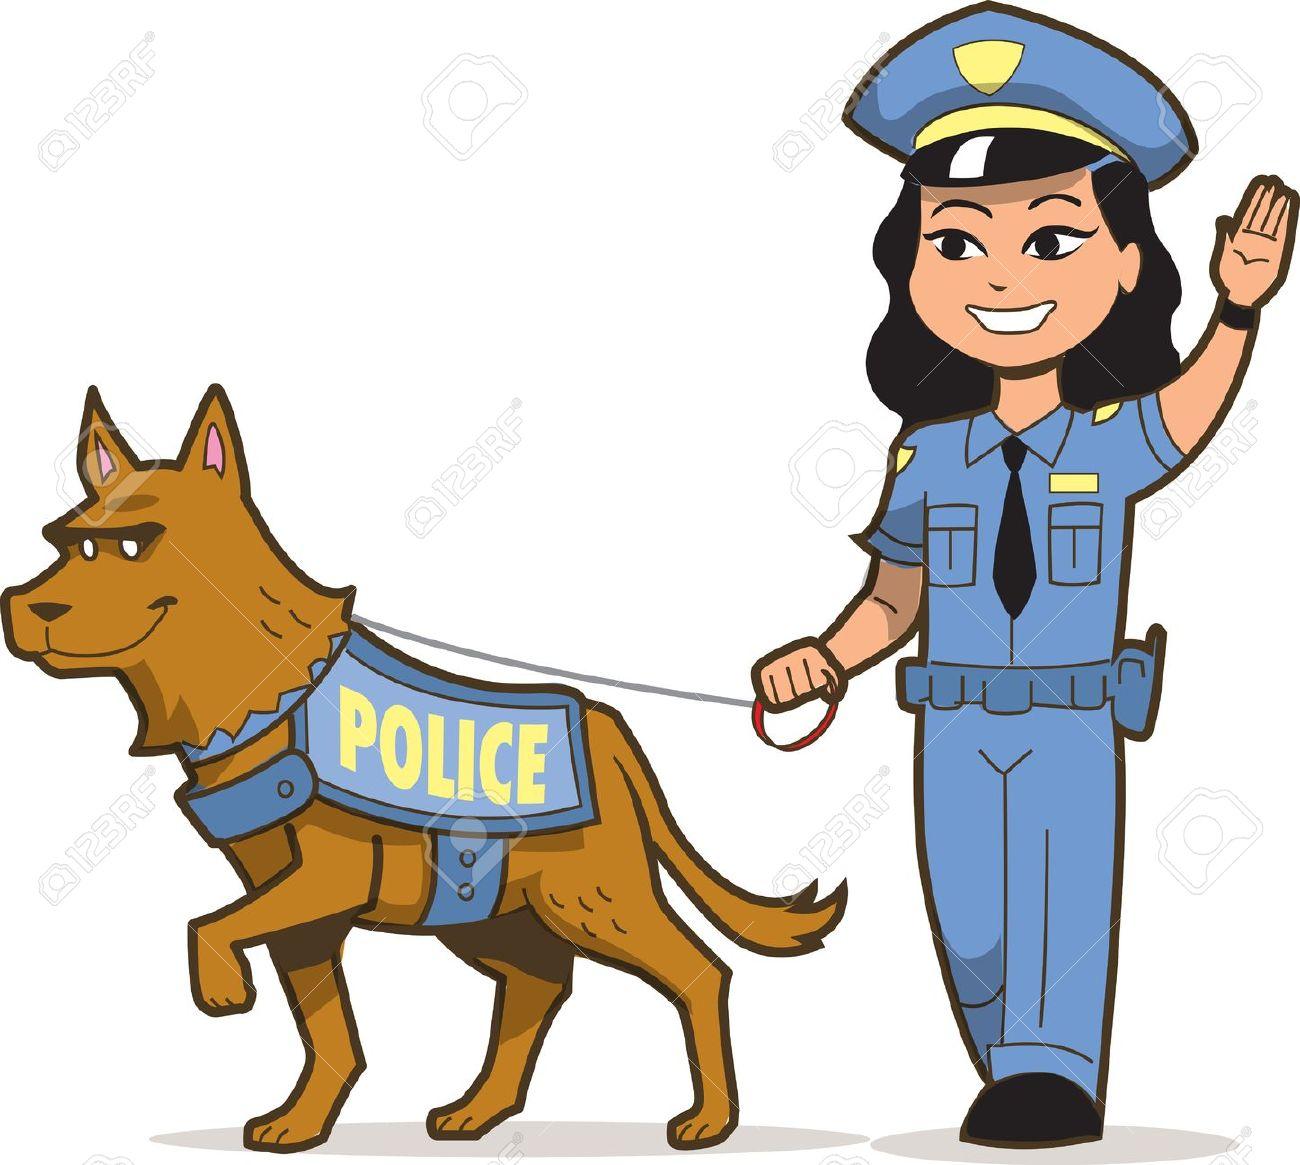 Police Dogs: K-9 Police Dog .-police dogs: K-9 Police Dog .-18